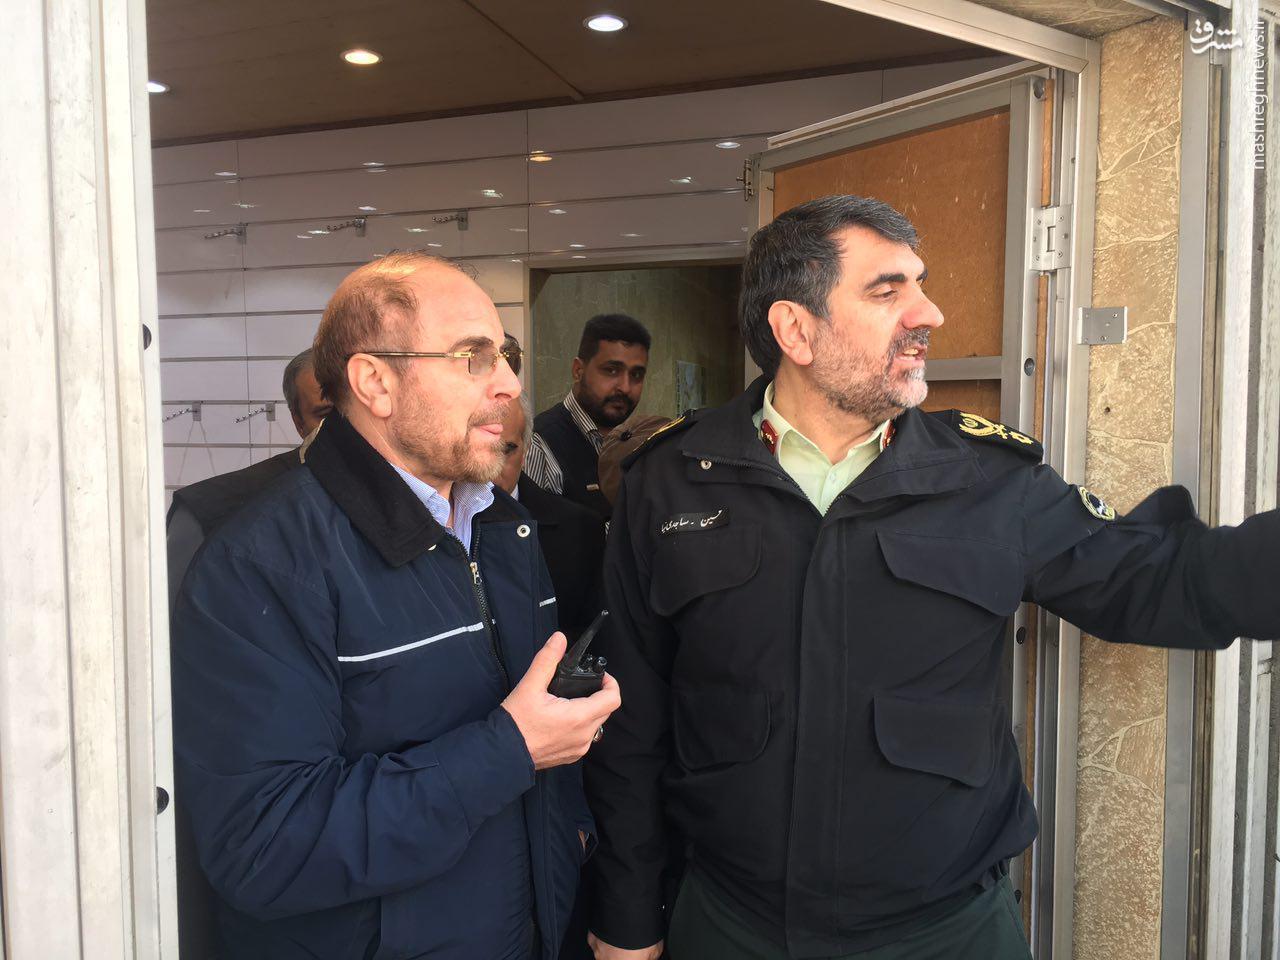 عکس/ حضور قالیباف در محل حادثه ساختمان پلاسکو